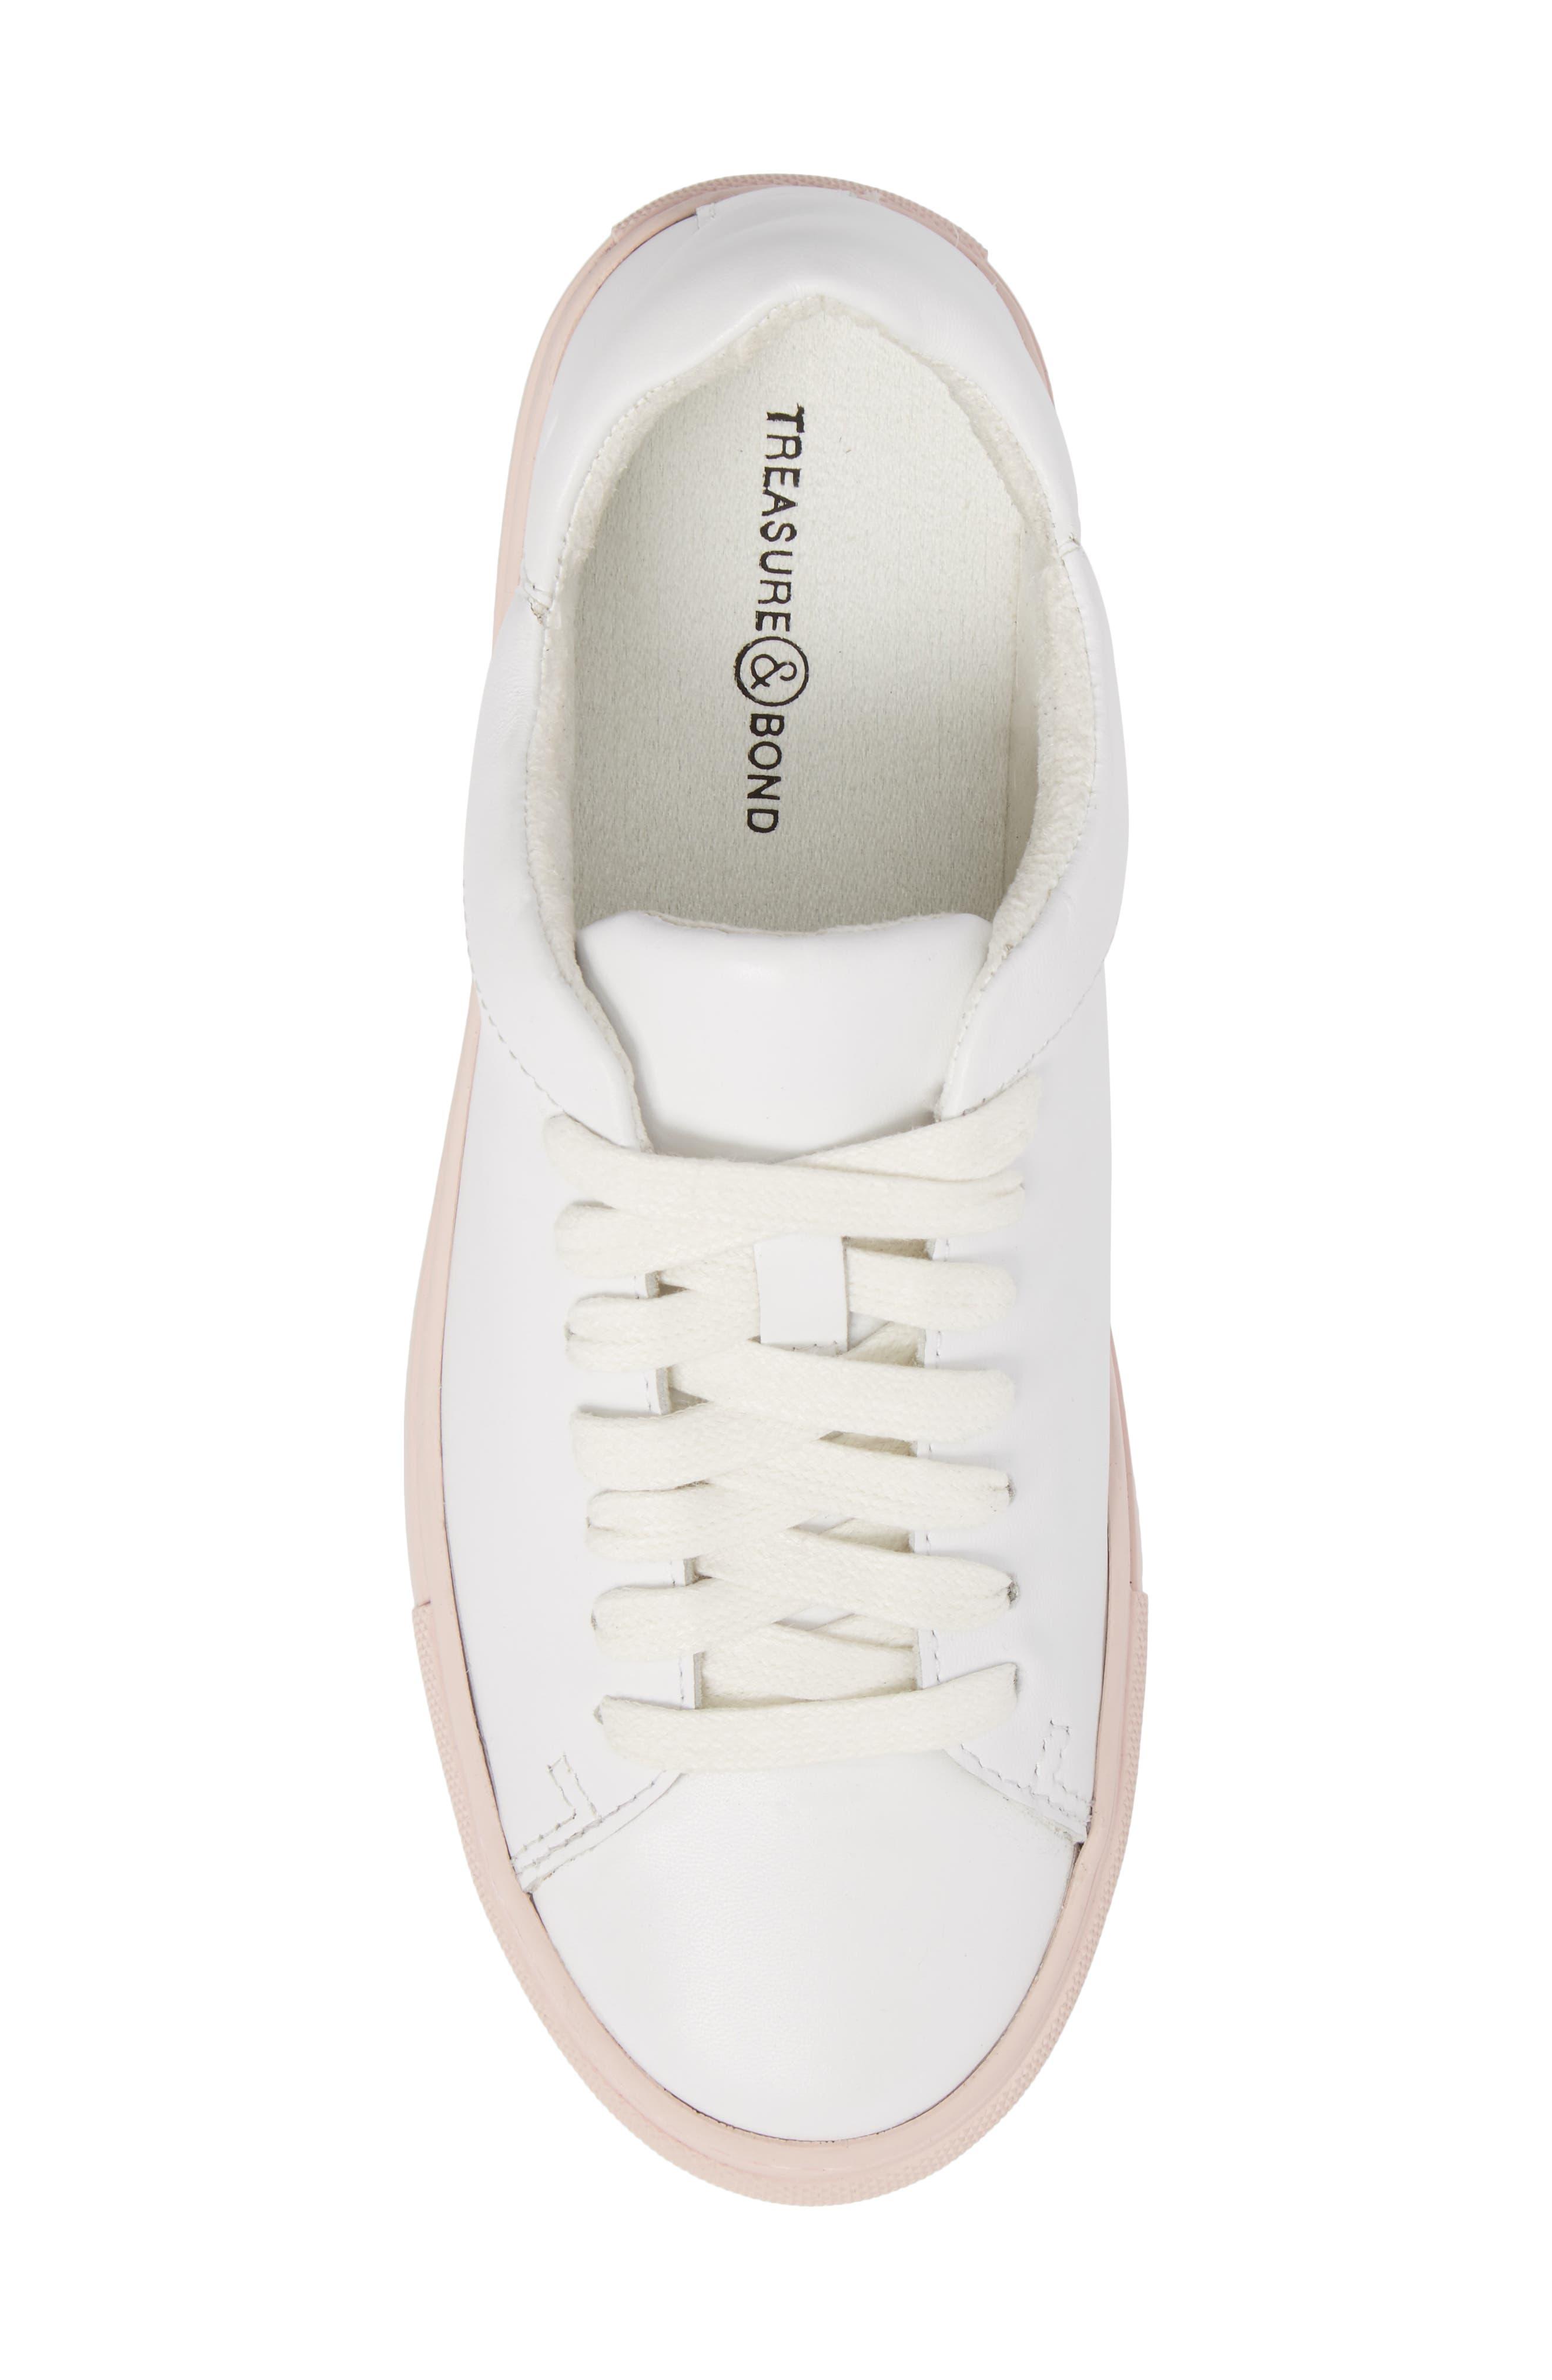 Cassidy Sneaker,                             Alternate thumbnail 5, color,                             100